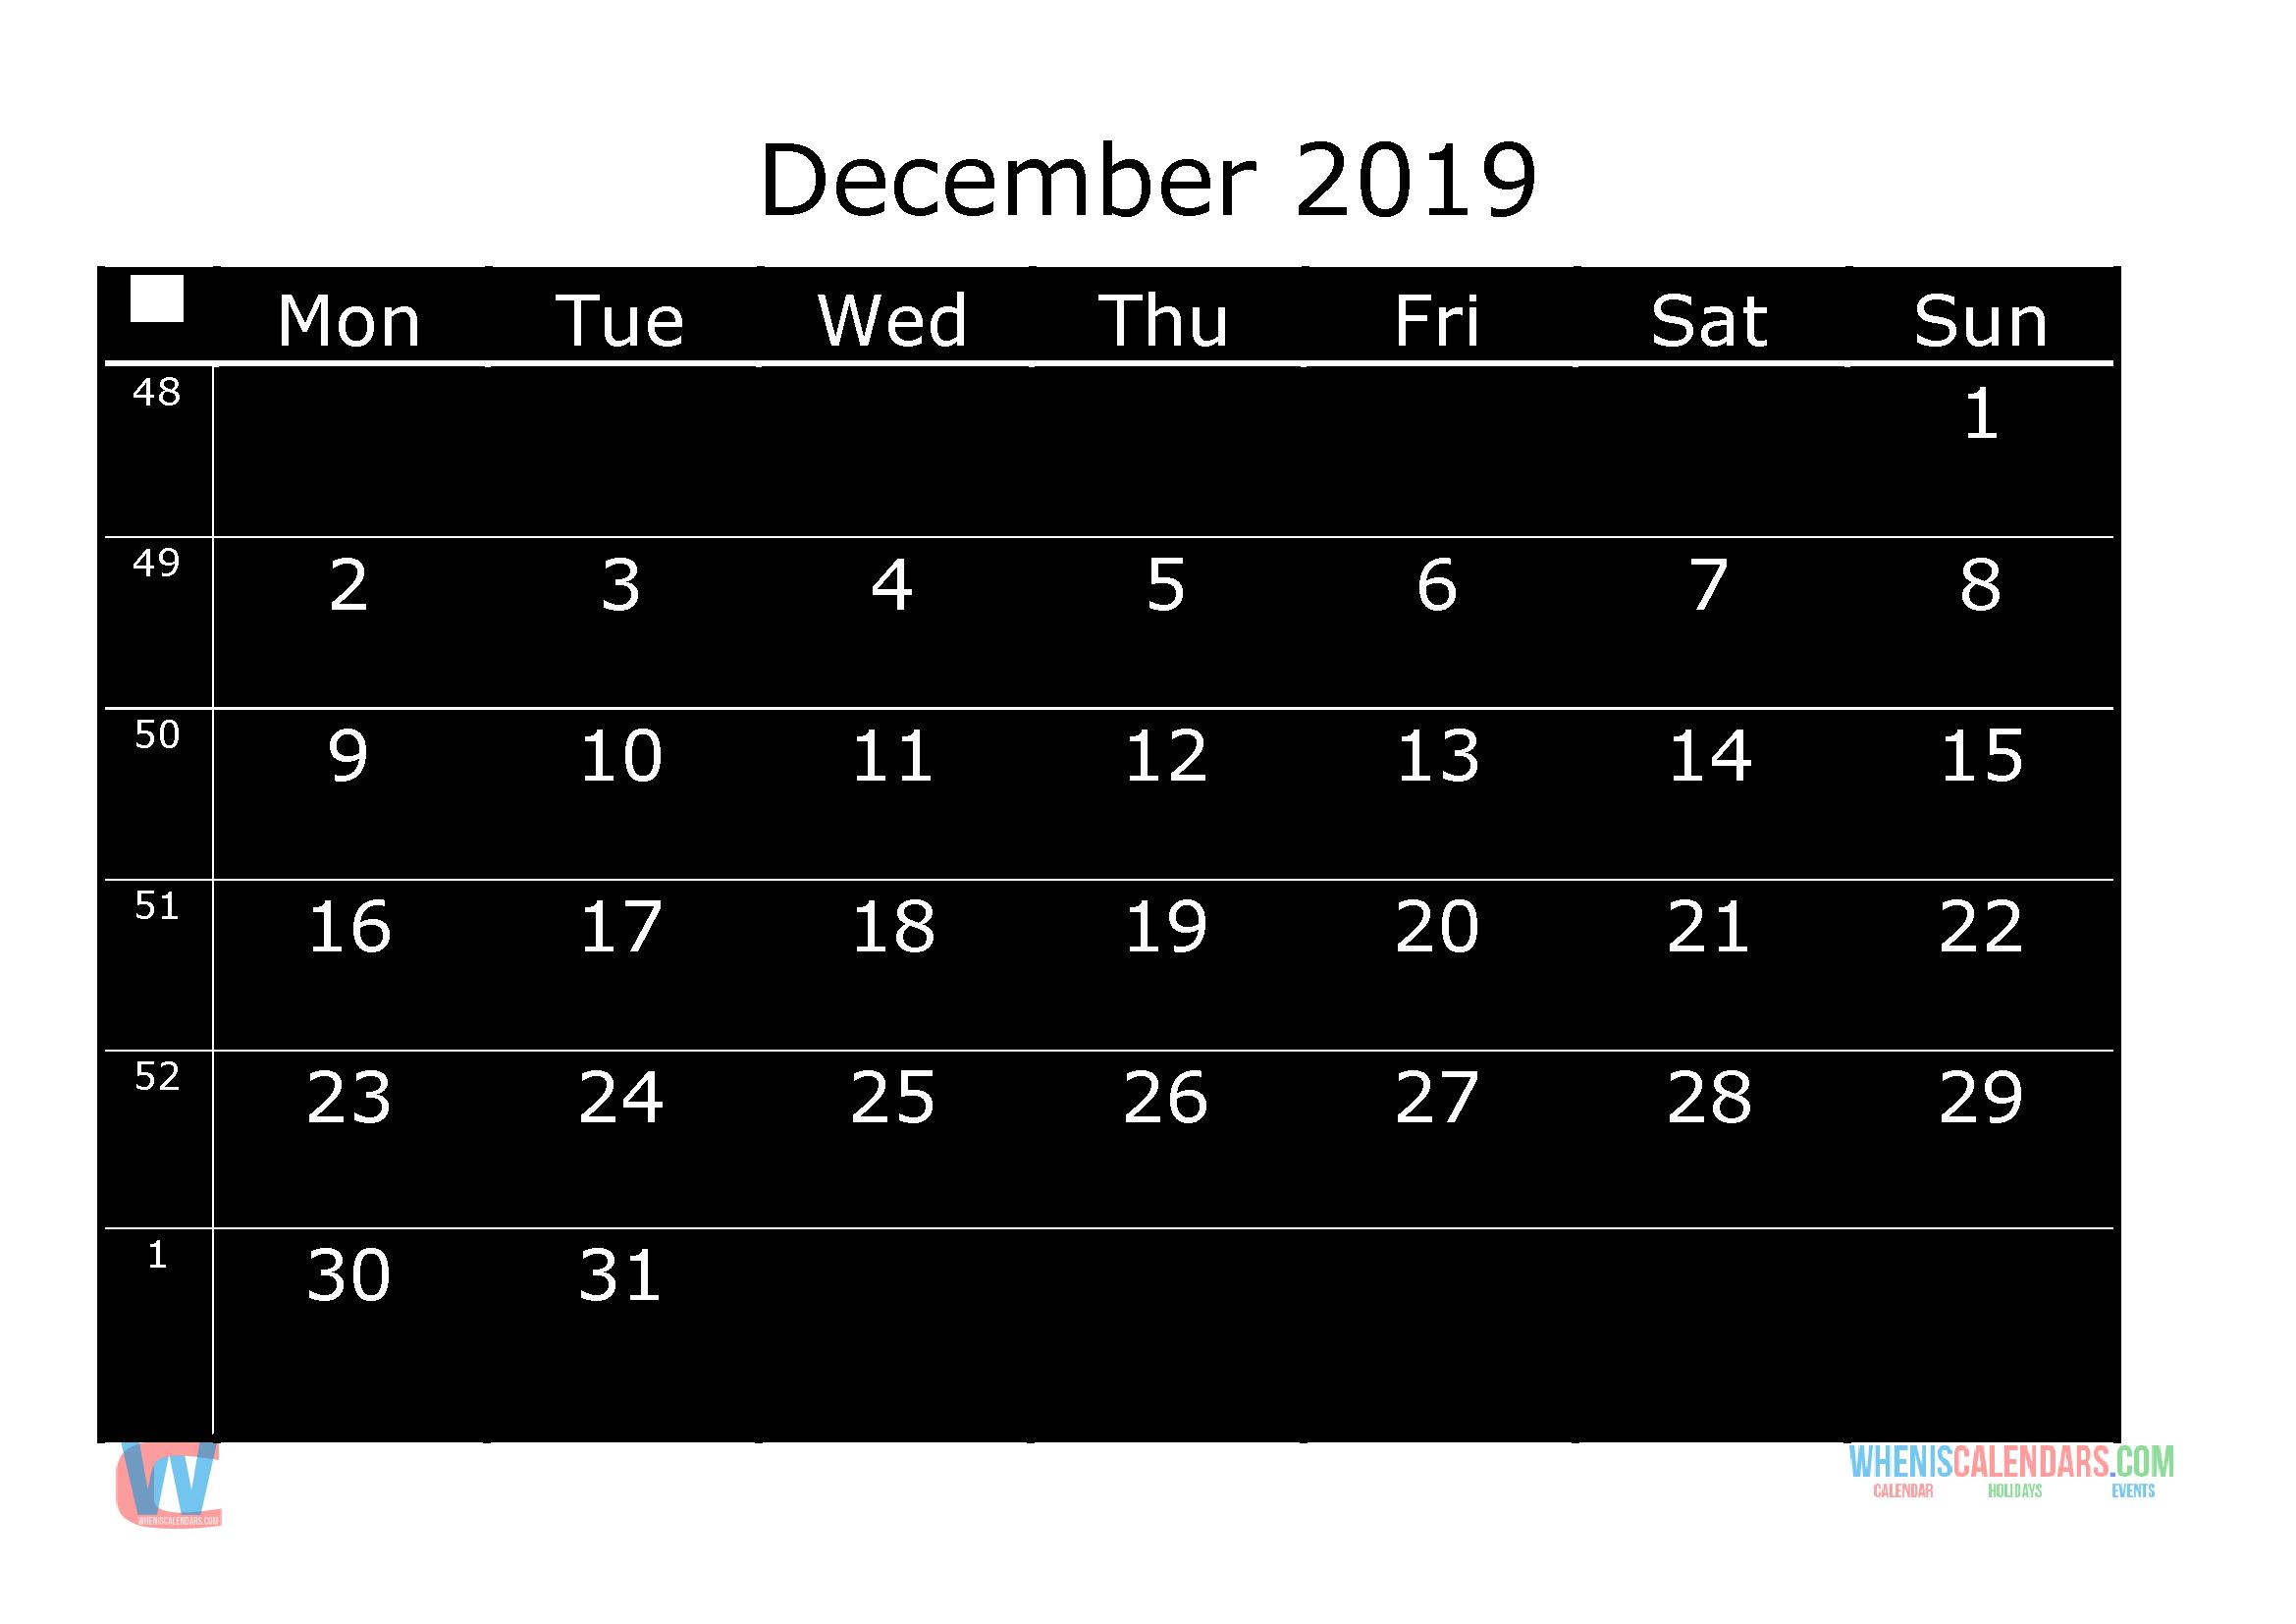 printable monthly calendar 2019 december week day starts